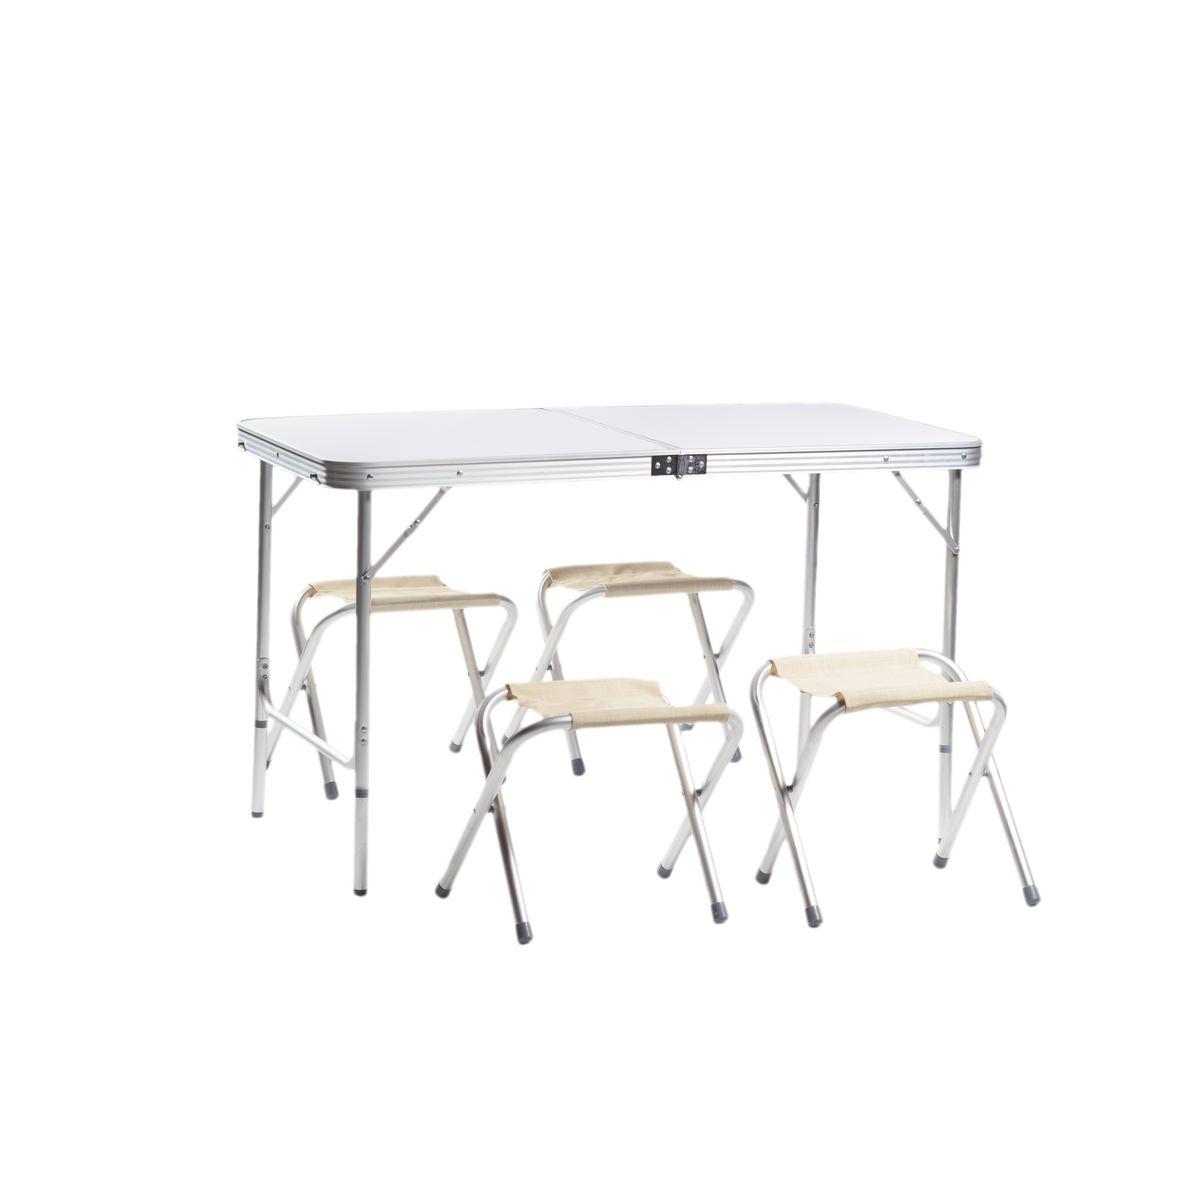 Набор мебели для пикника Green Glade М5102, 5 предметов